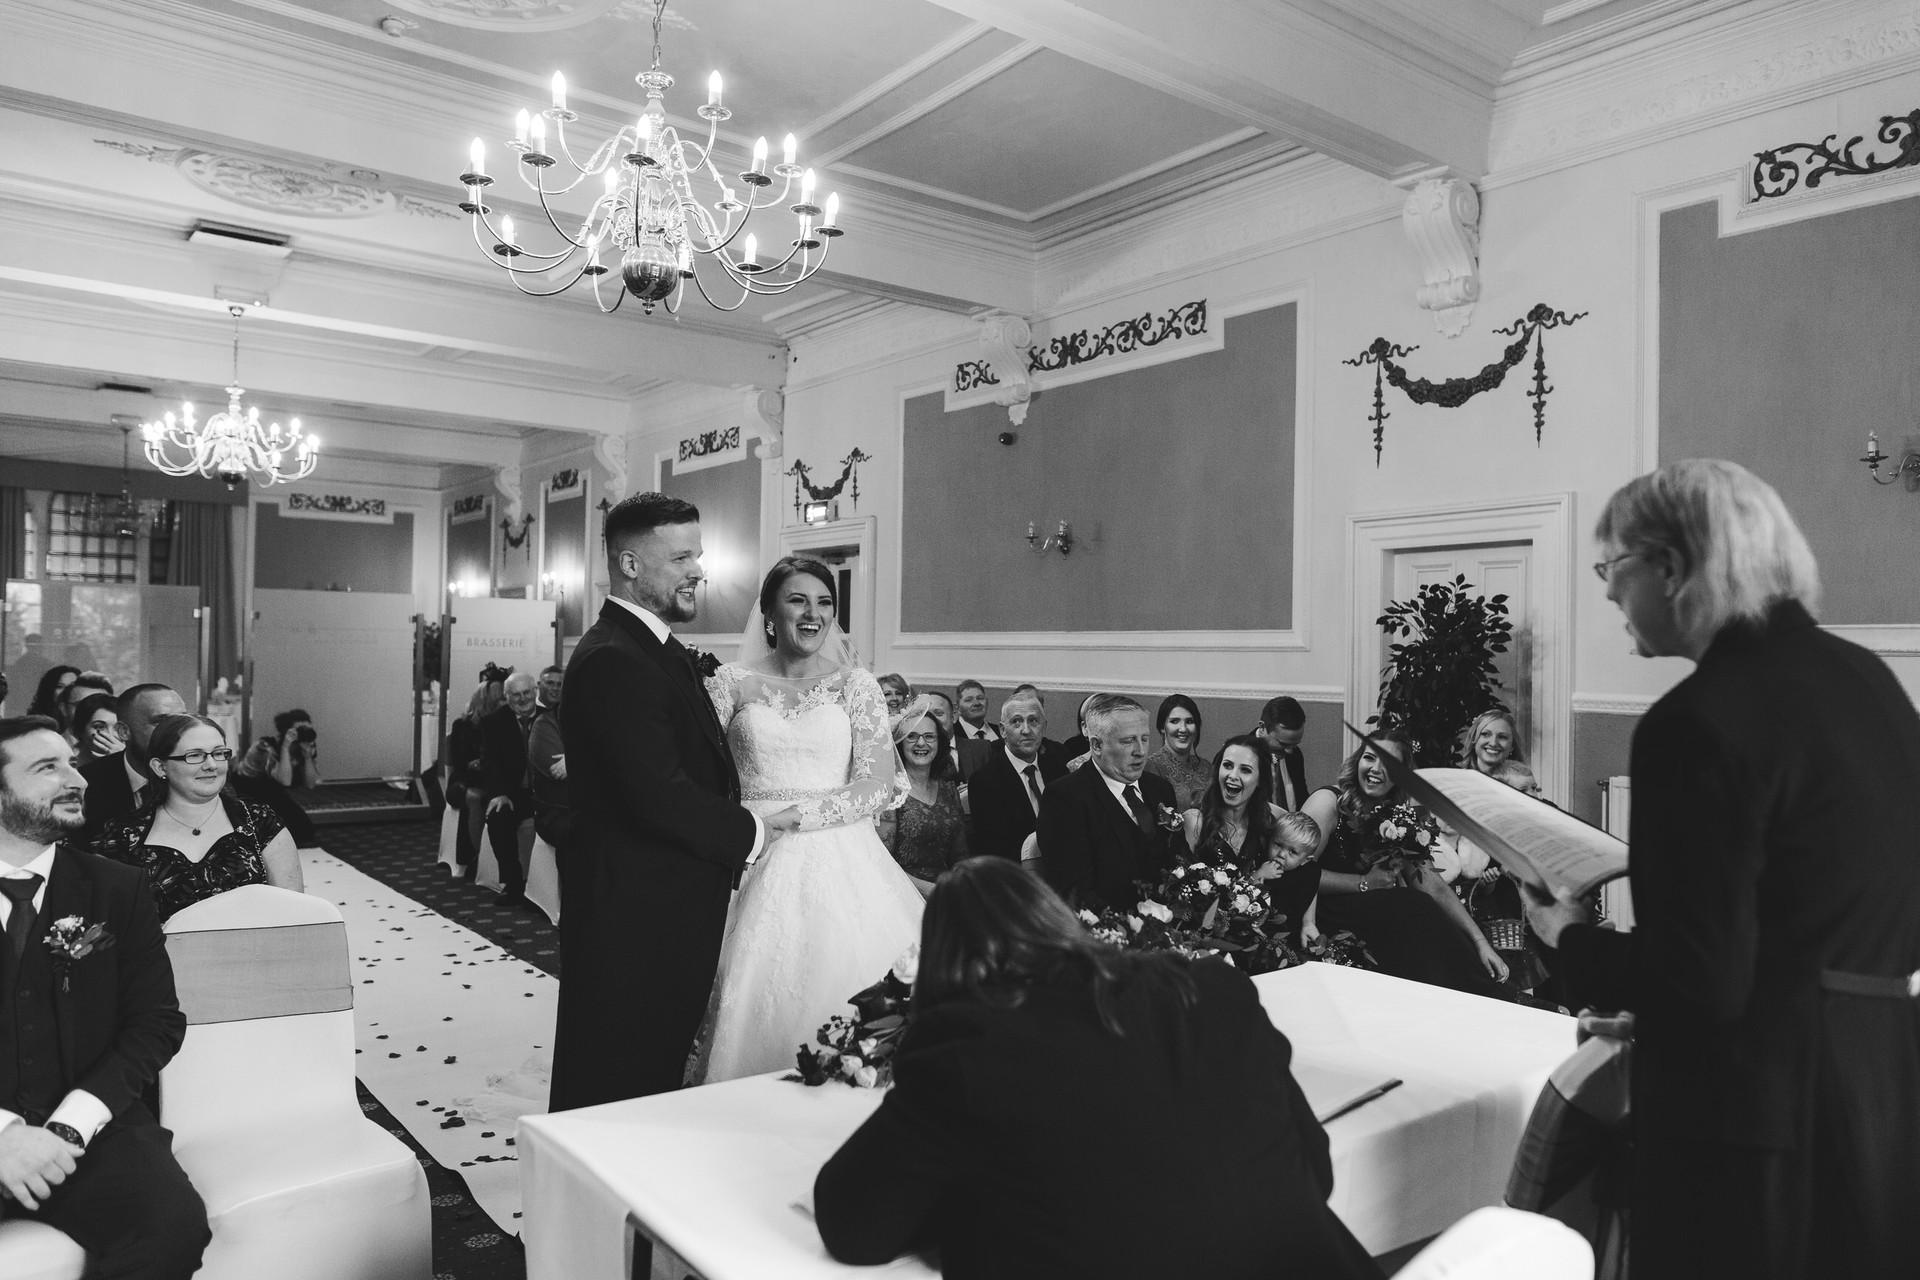 ilkley-west-yorkshire-wedding-128.jpg